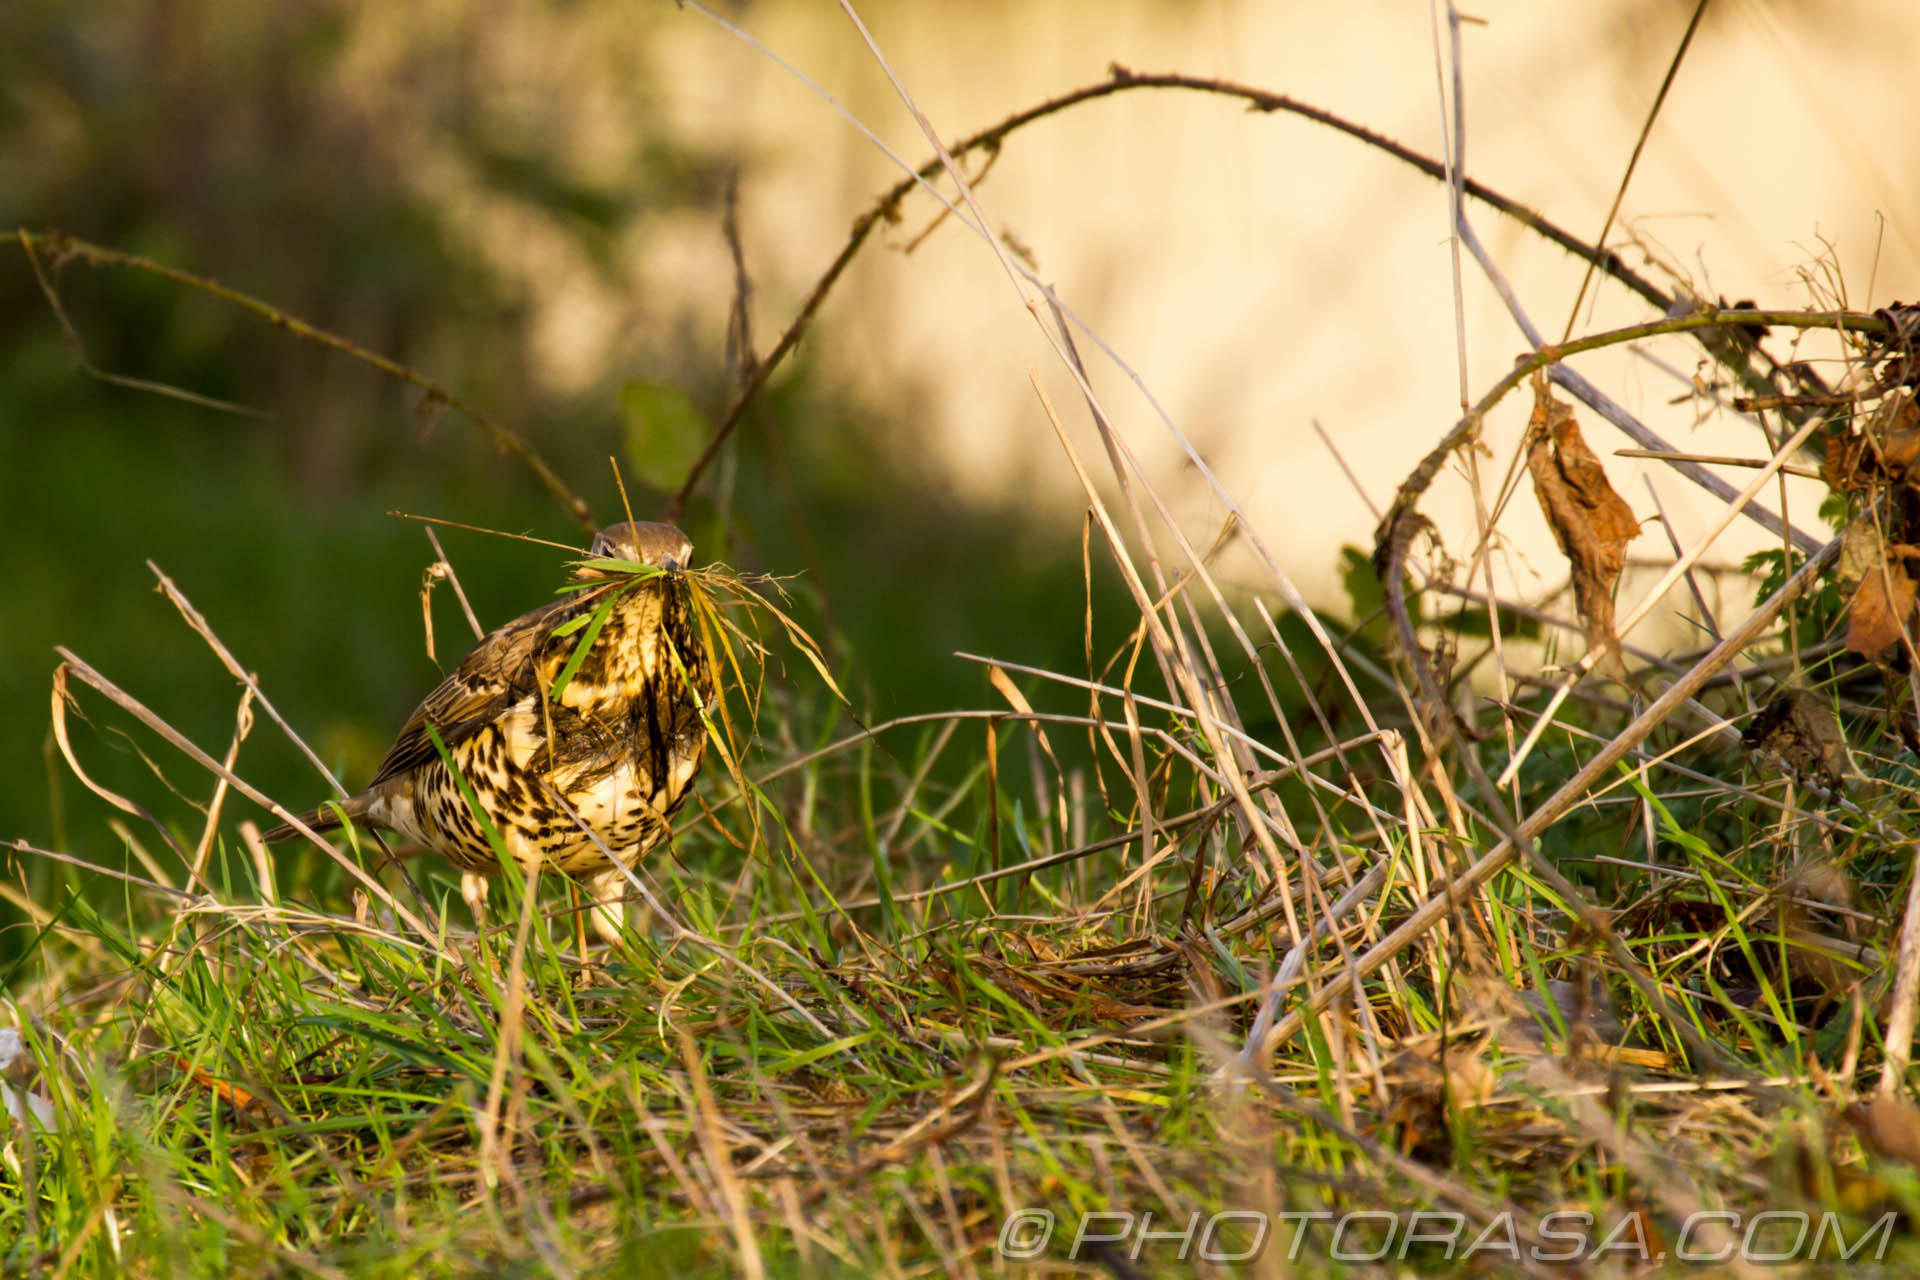 http://photorasa.com/mistle-thrush-scavenging-nest-materials/mouthful-of-grass/